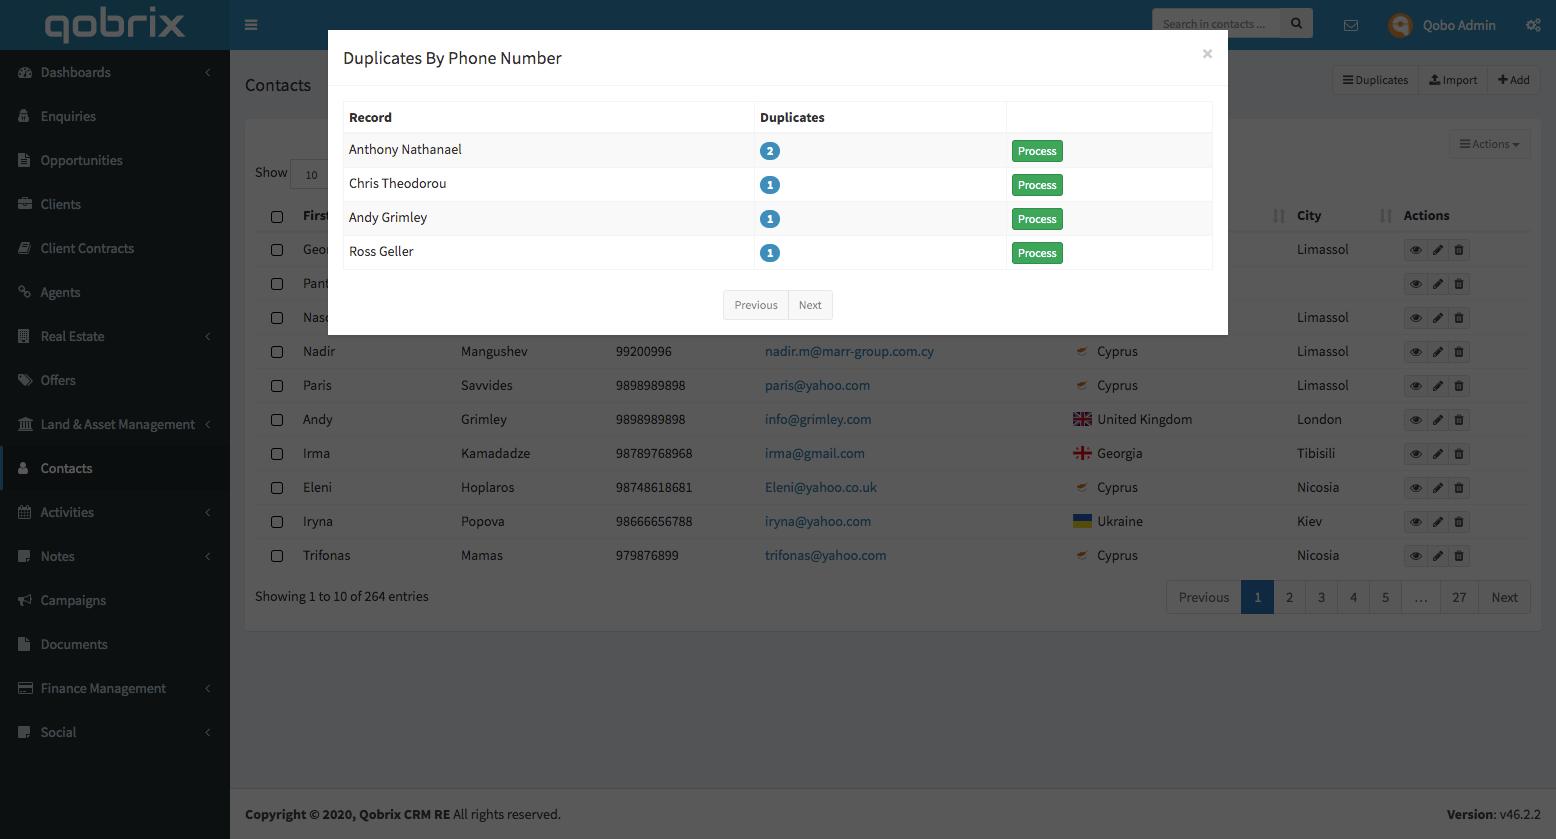 Qobrix Duplicates module